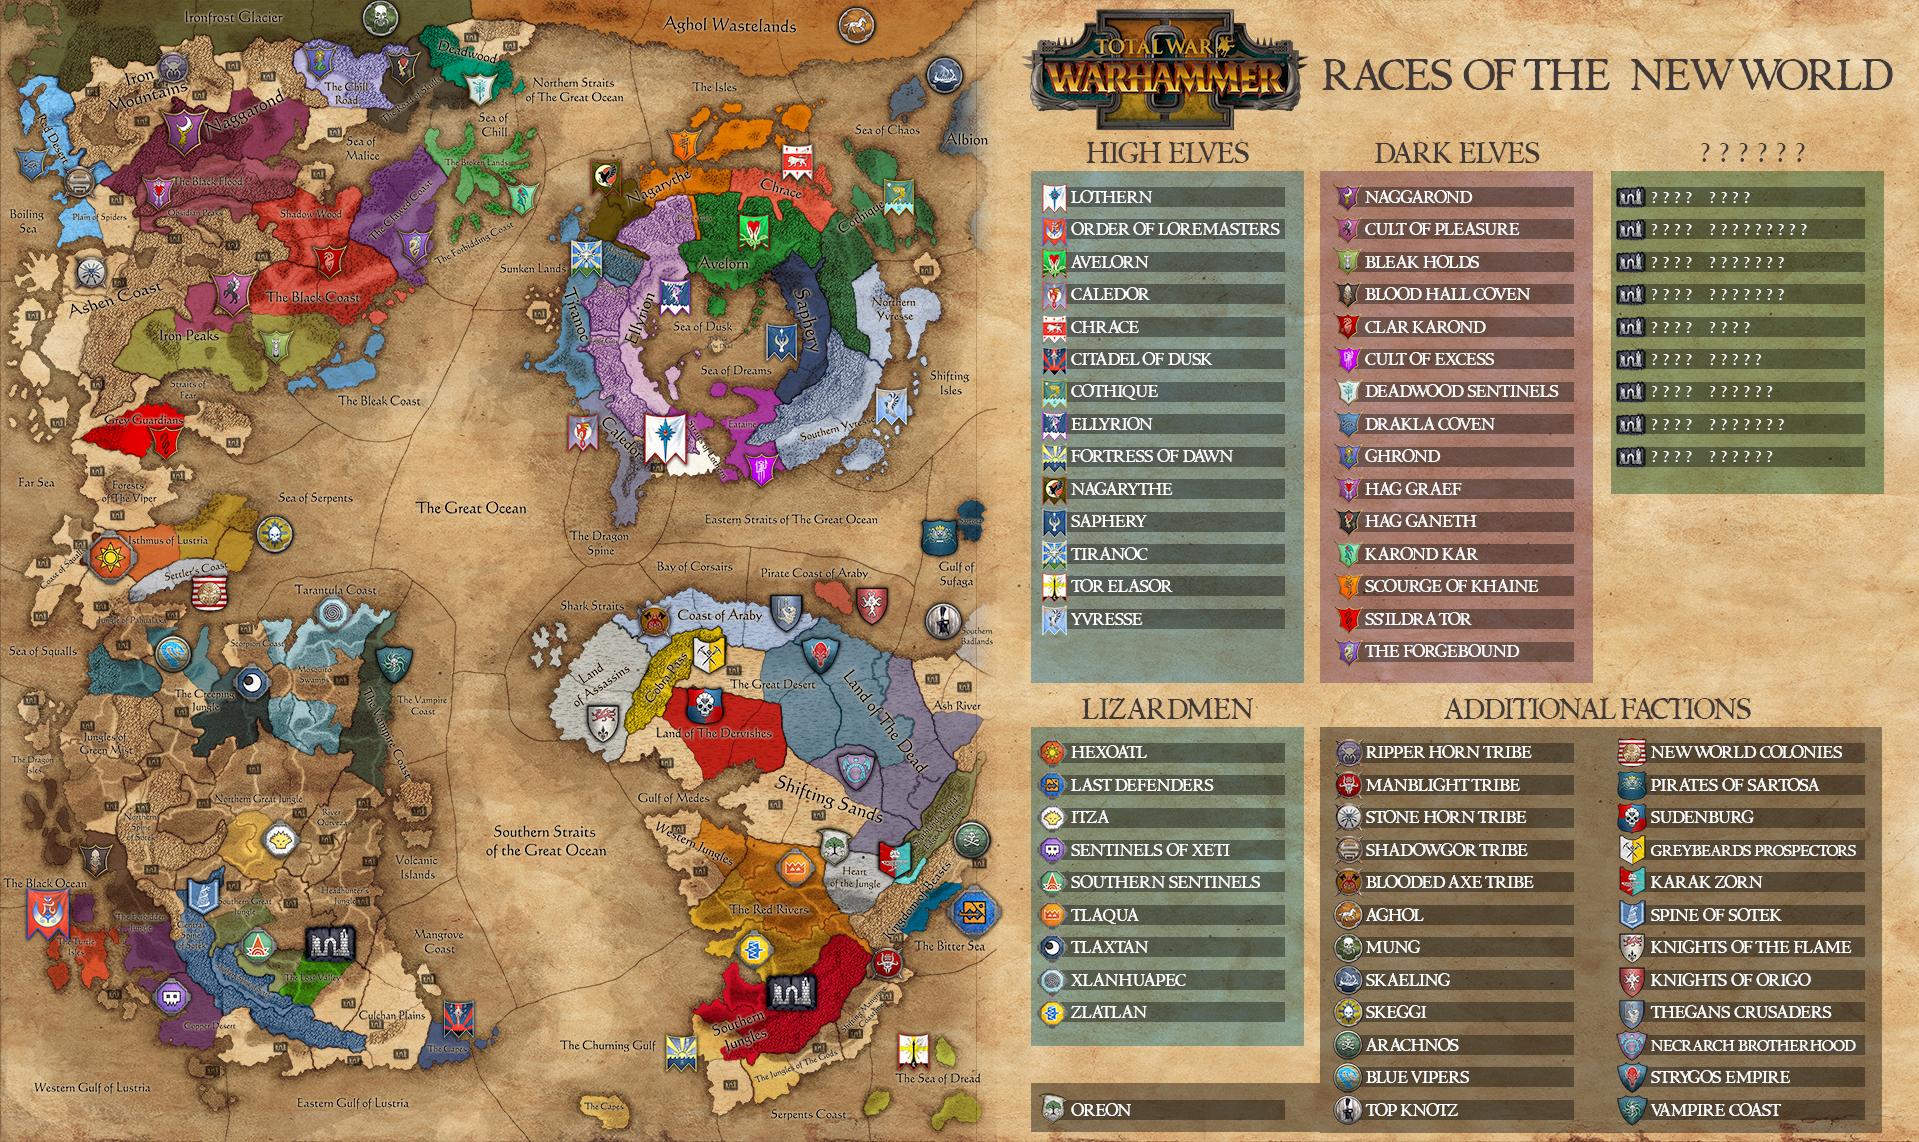 Desvelado el Mapa de Total War Warhammer II